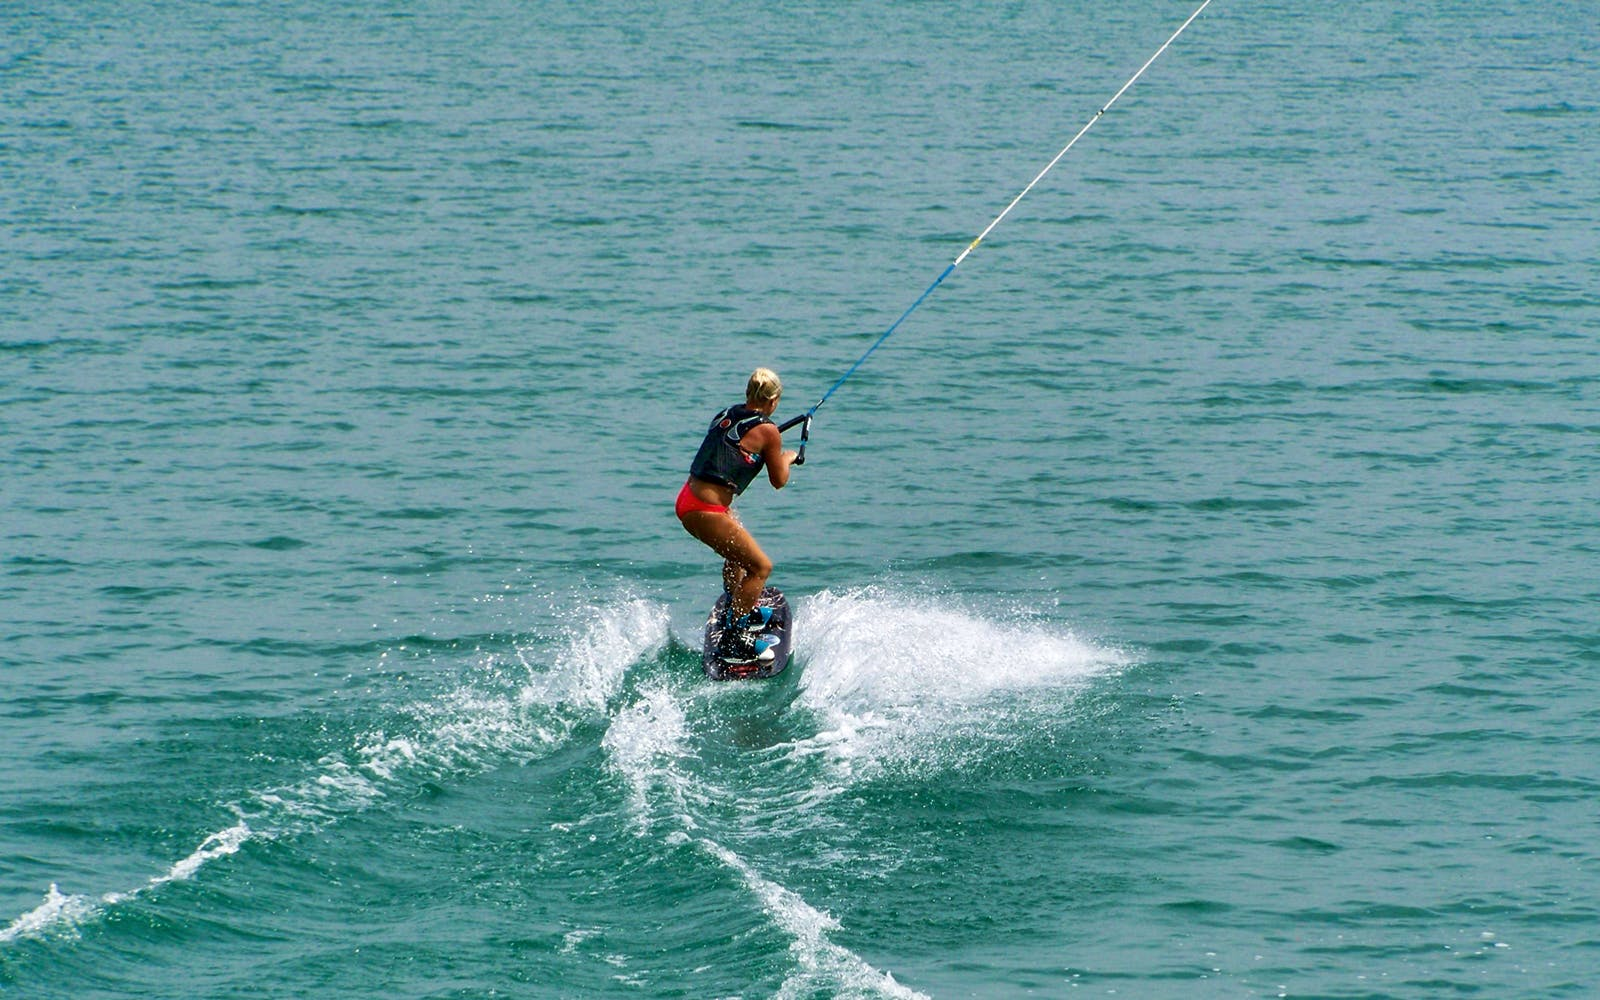 Water sports in Dubai - zup boarding